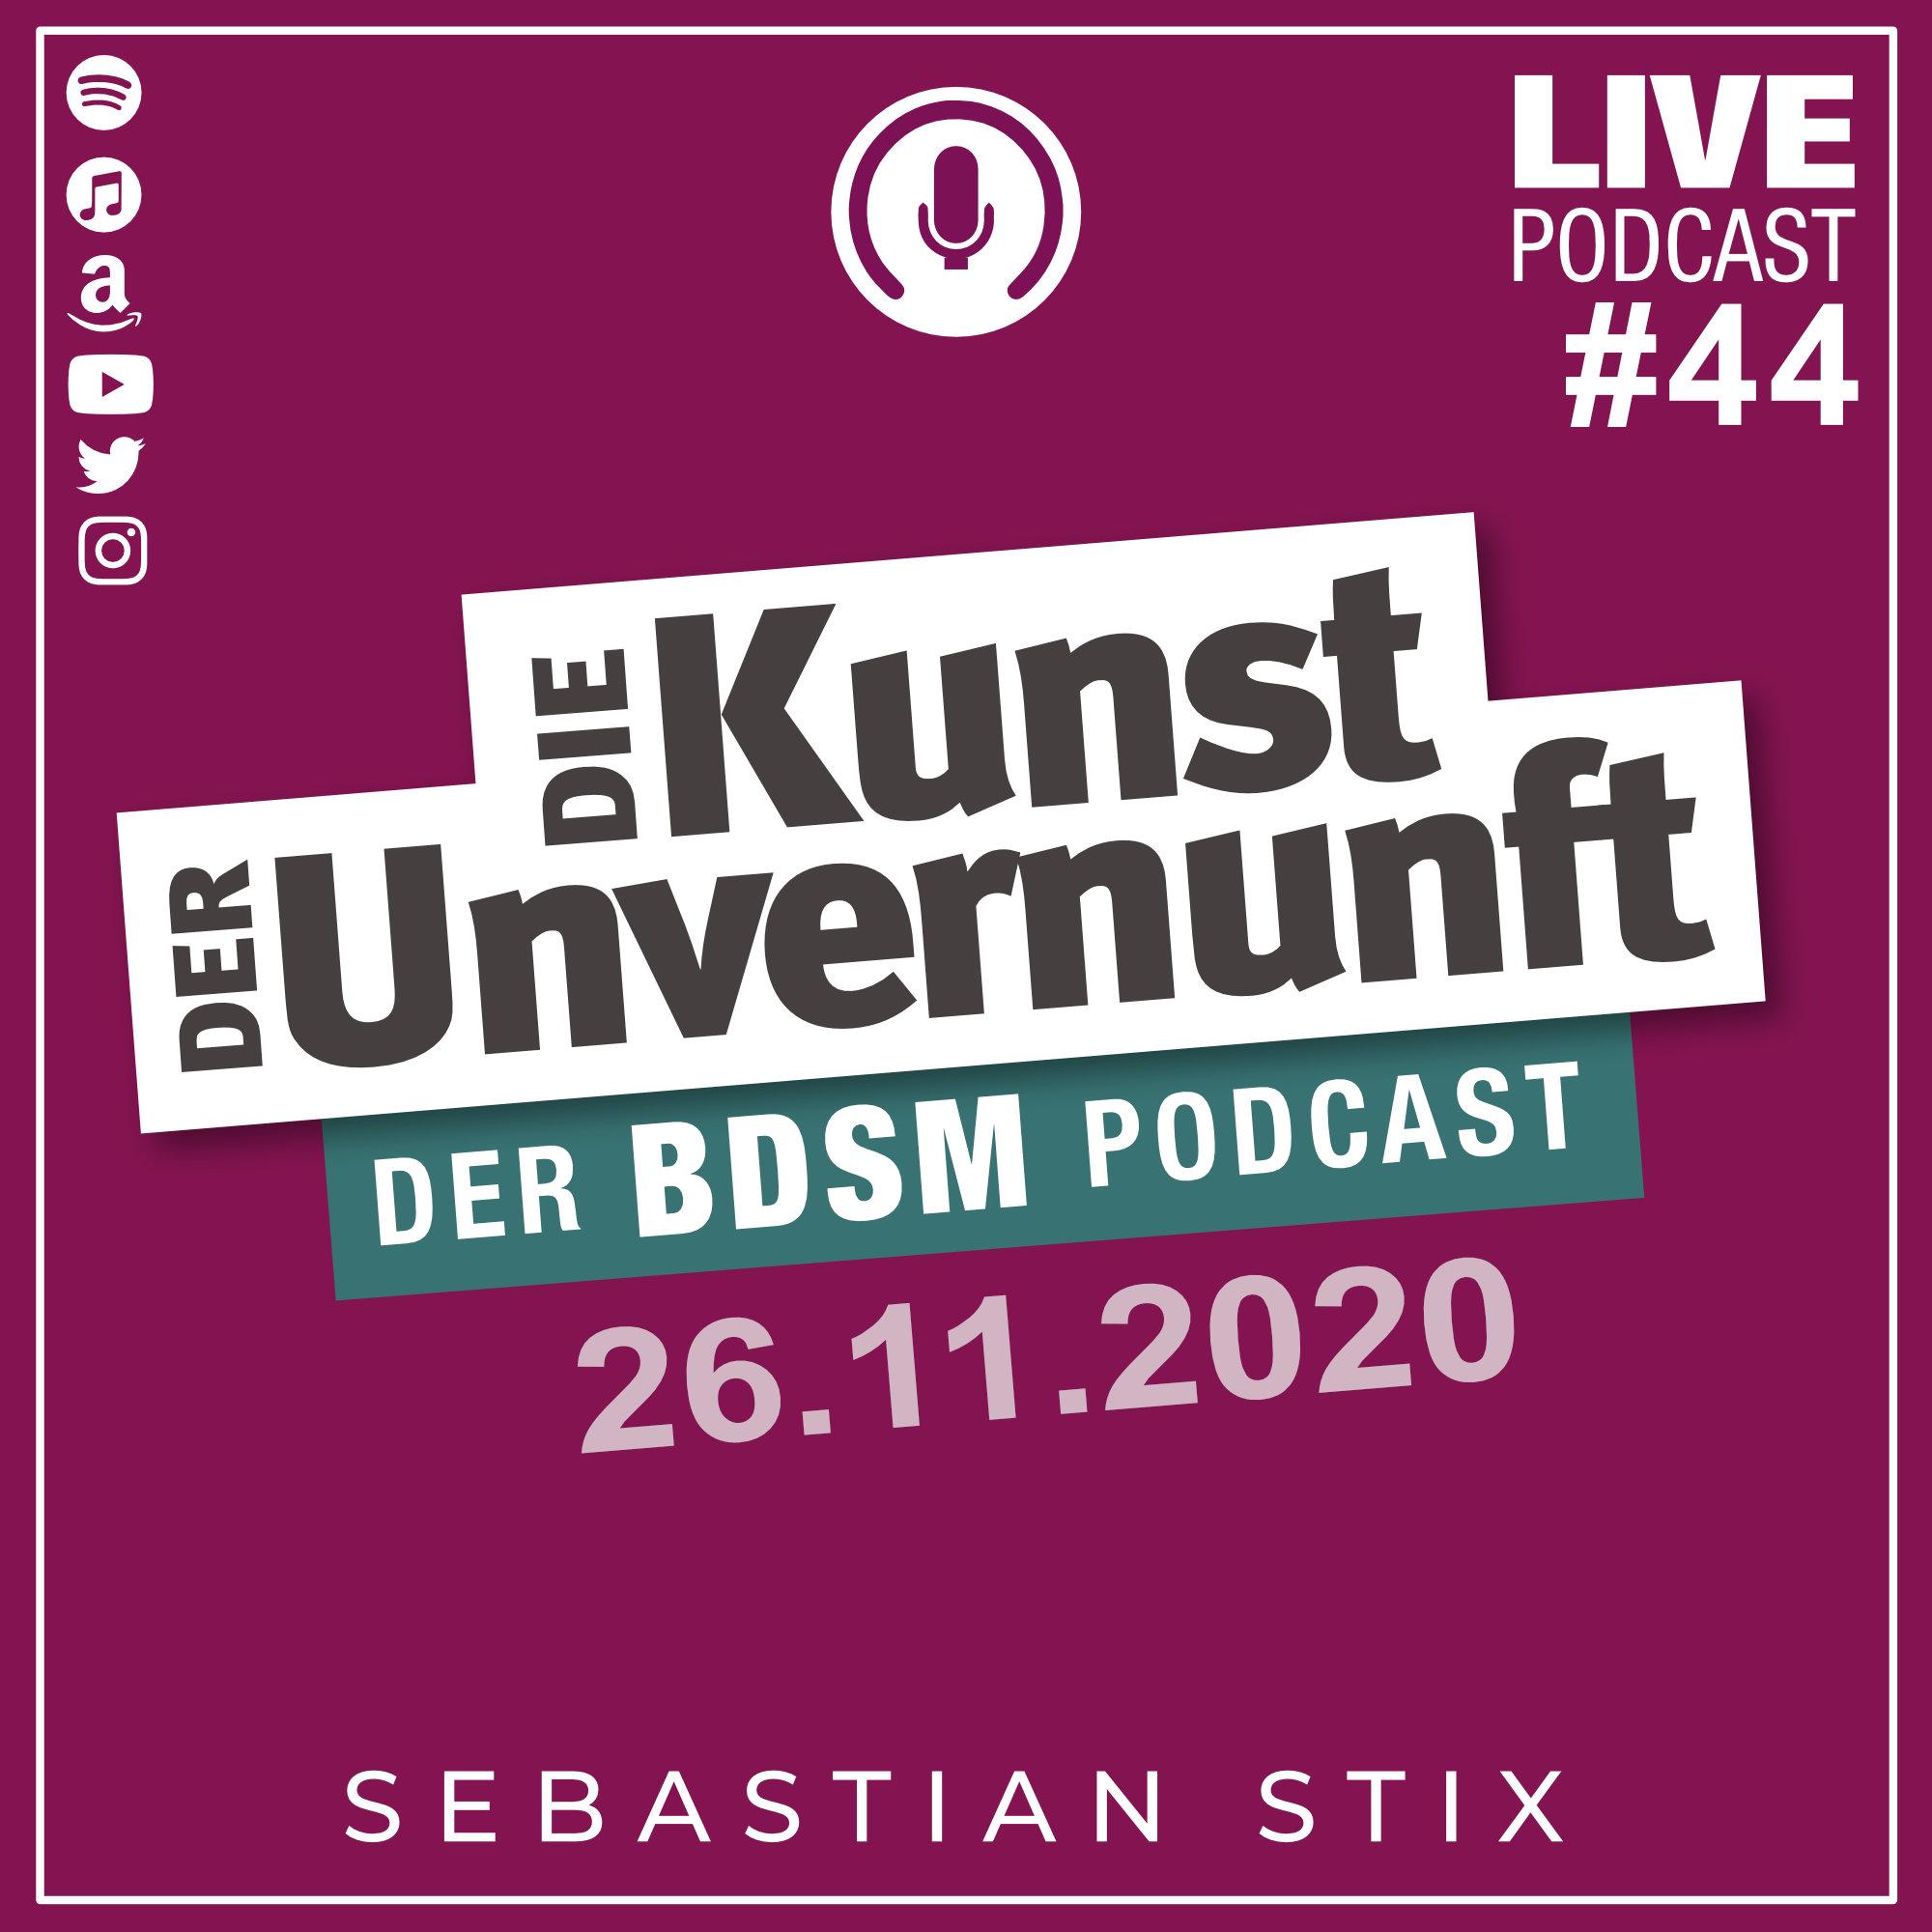 Unvernunft Live 26.11.20 - 2 Jahre Unvernunft